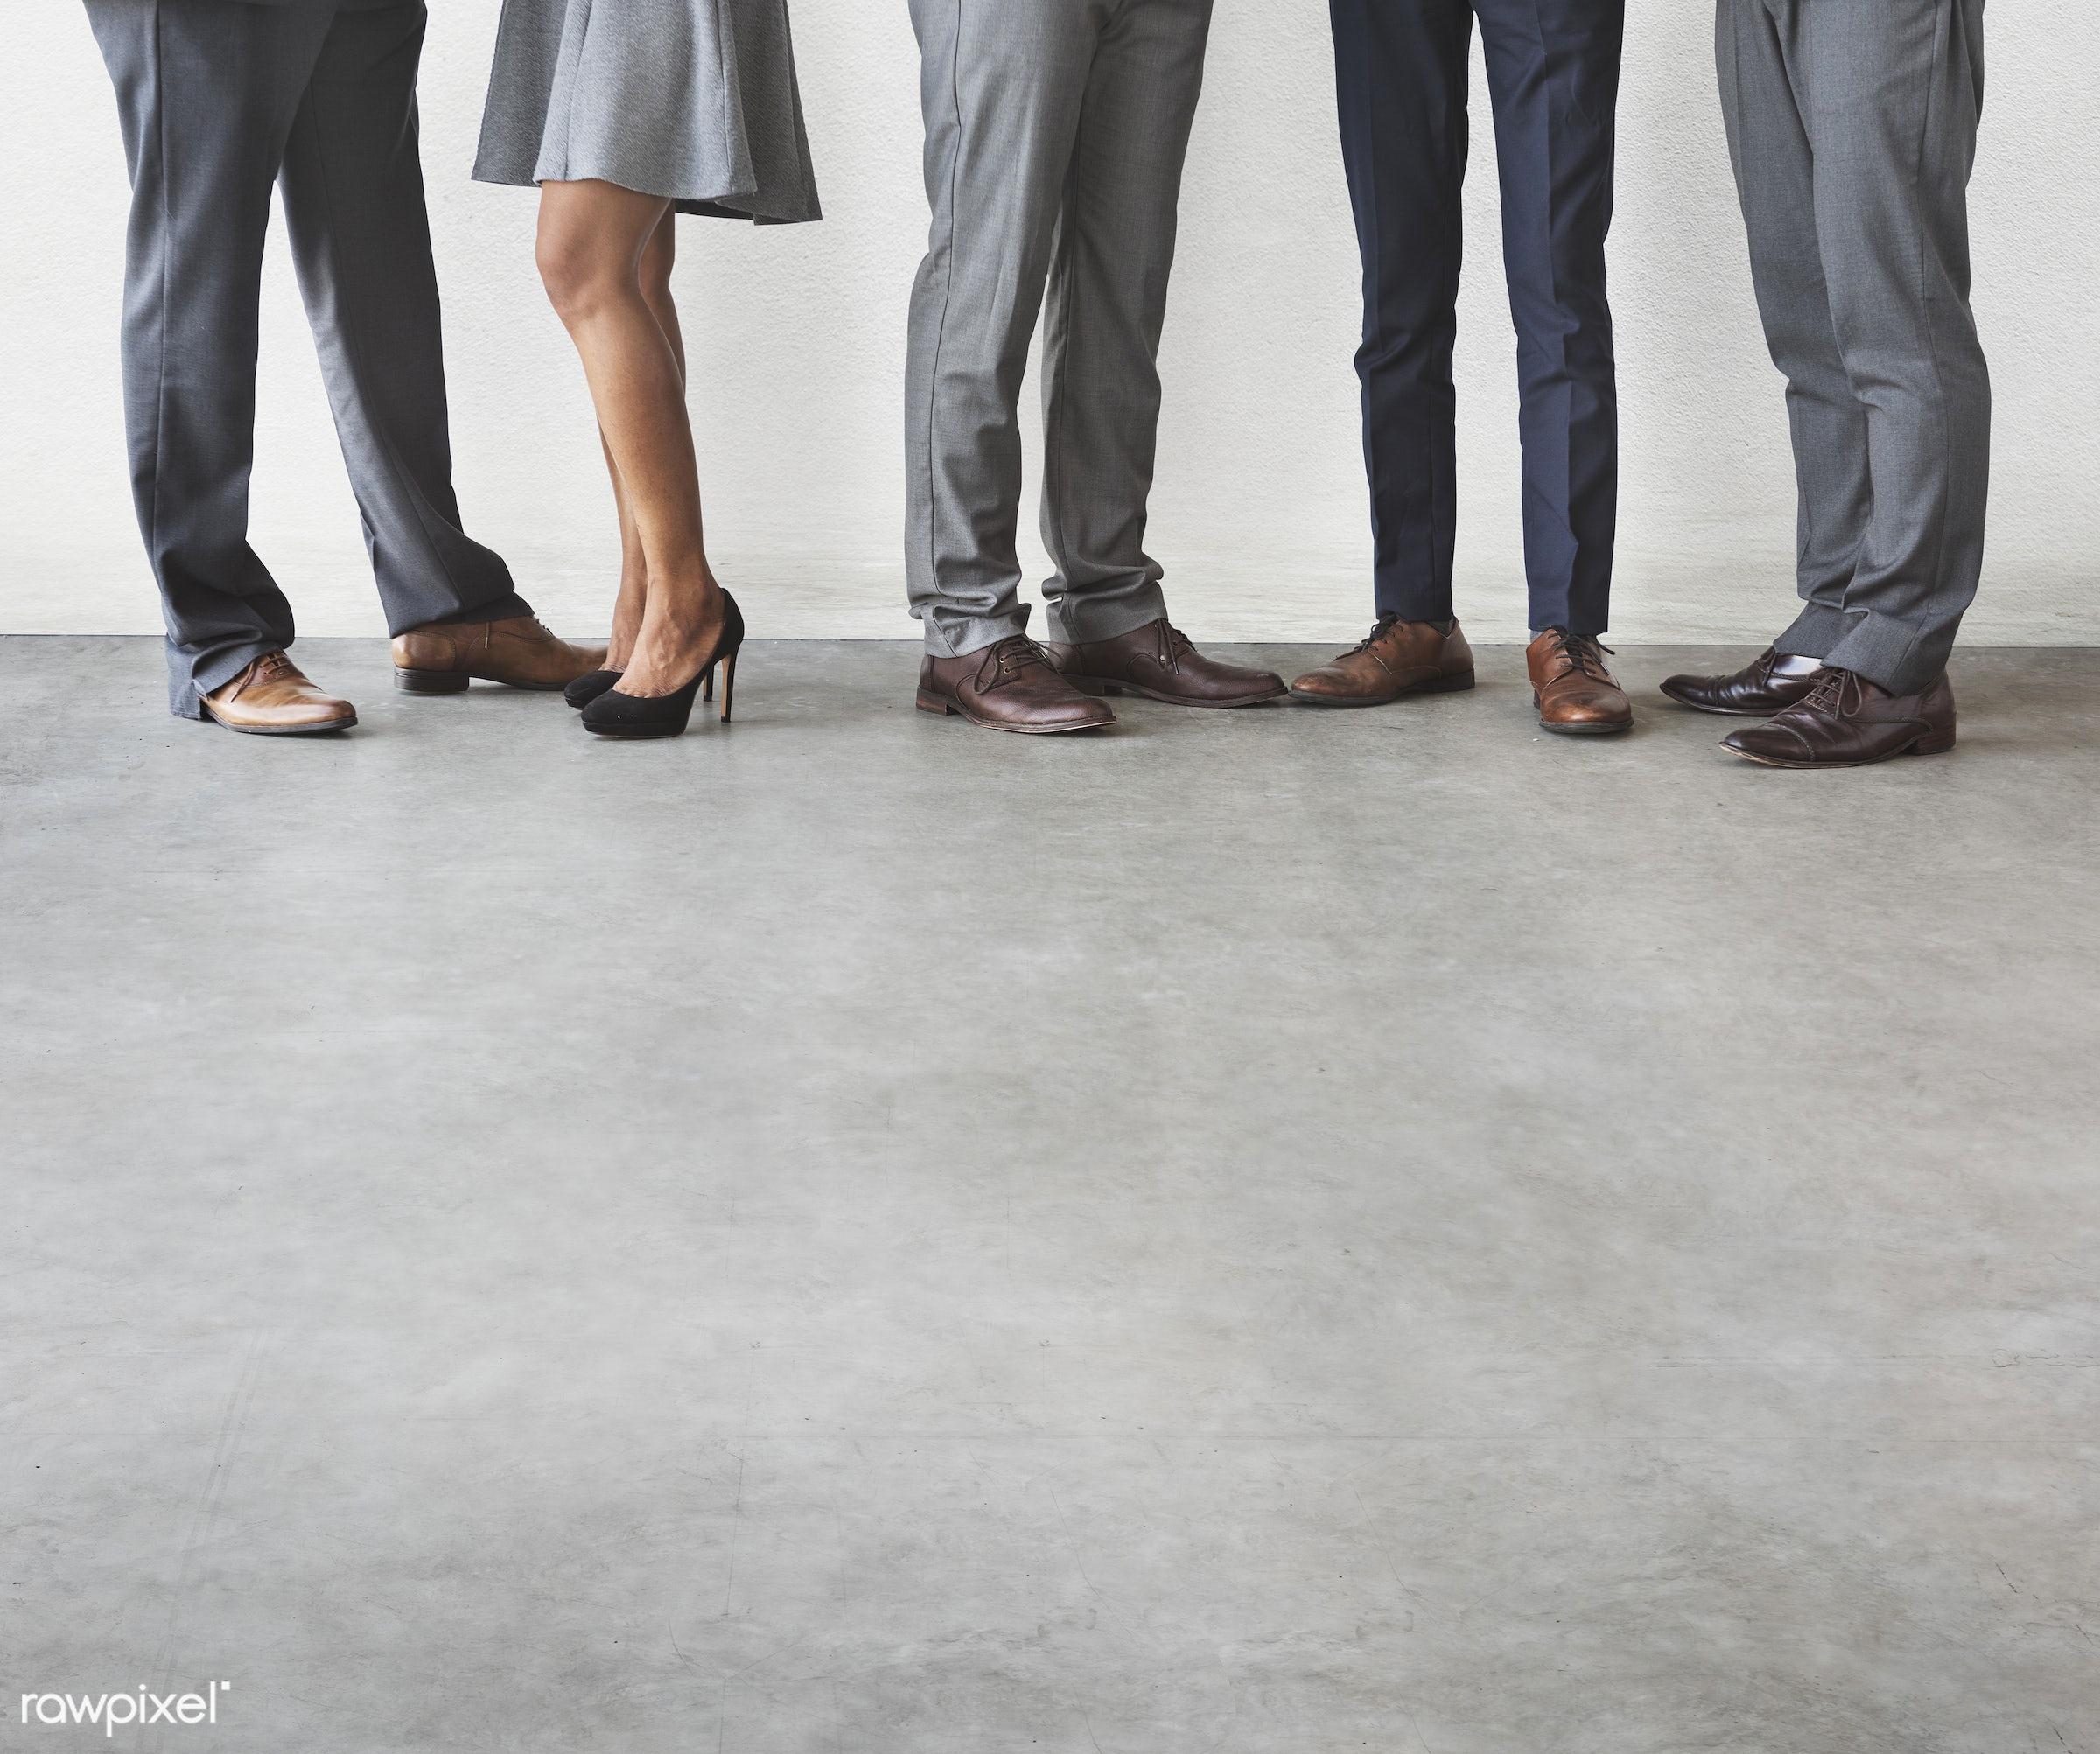 variation, analysing, corporation, people, business, teamwork, friends, friendship, men, coworker, financial, diversity,...